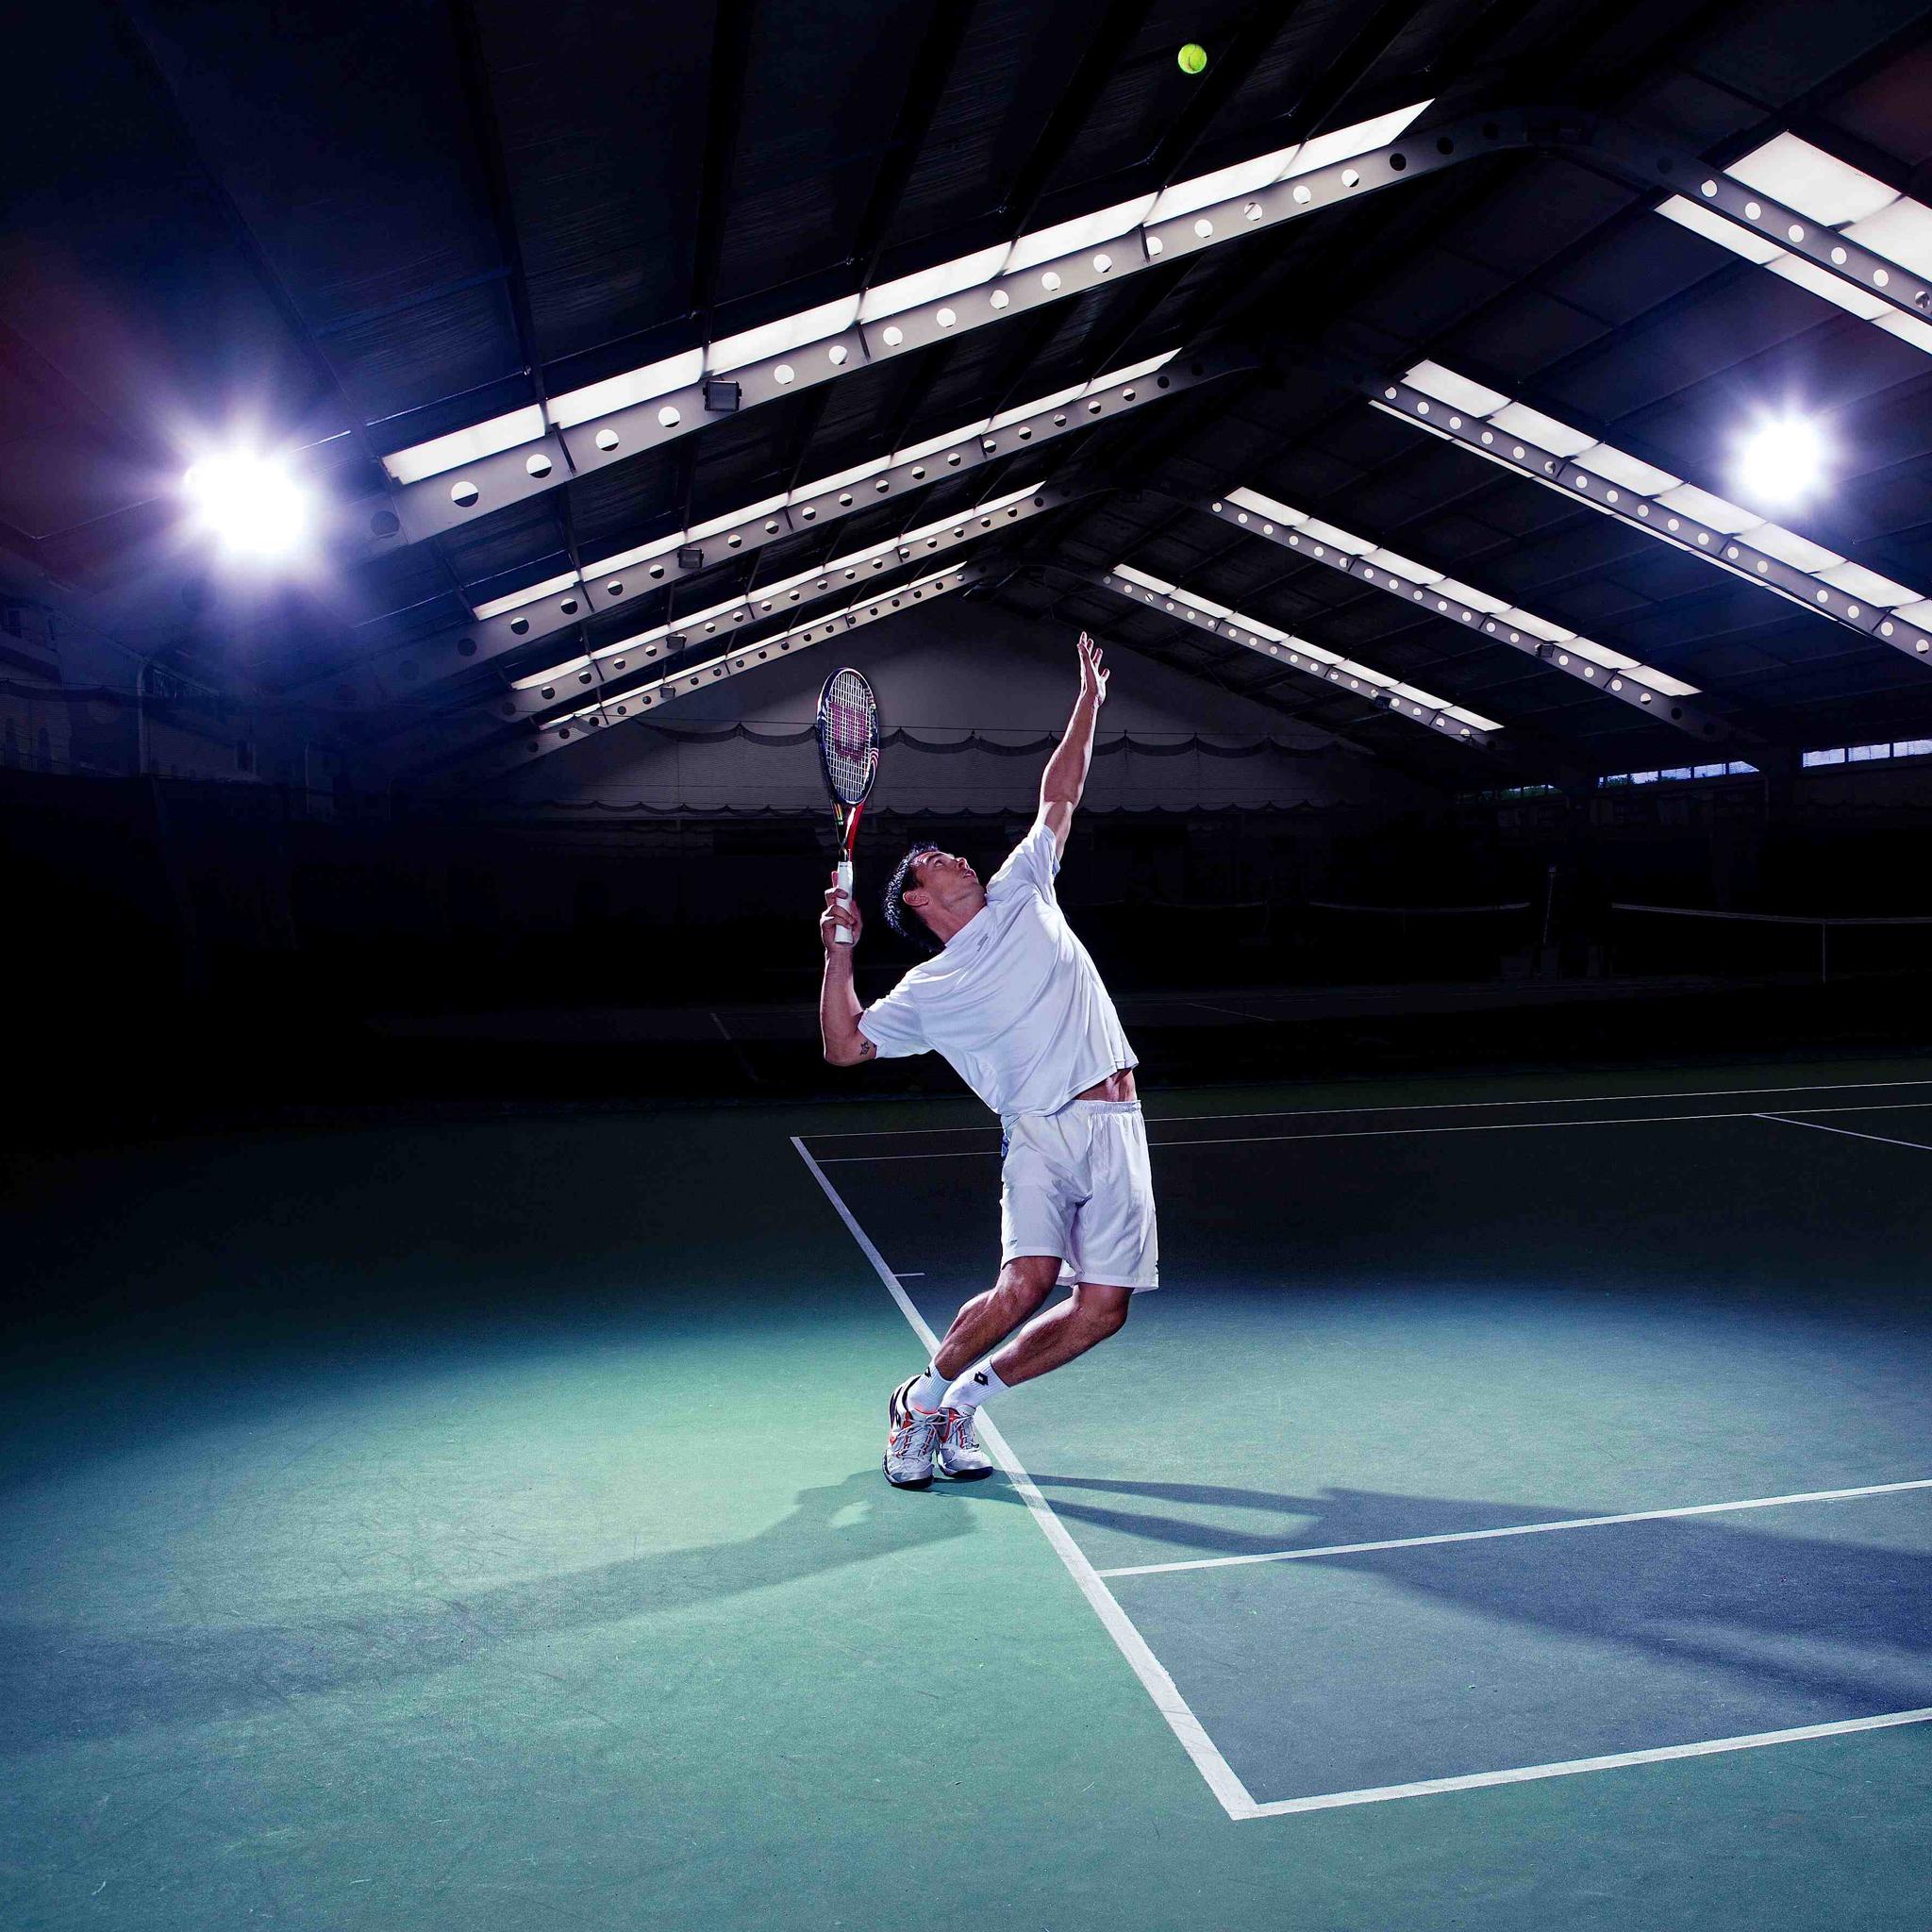 Tennis 3Wallpapers iPad Retina Wilson Tennis   iPad Retina